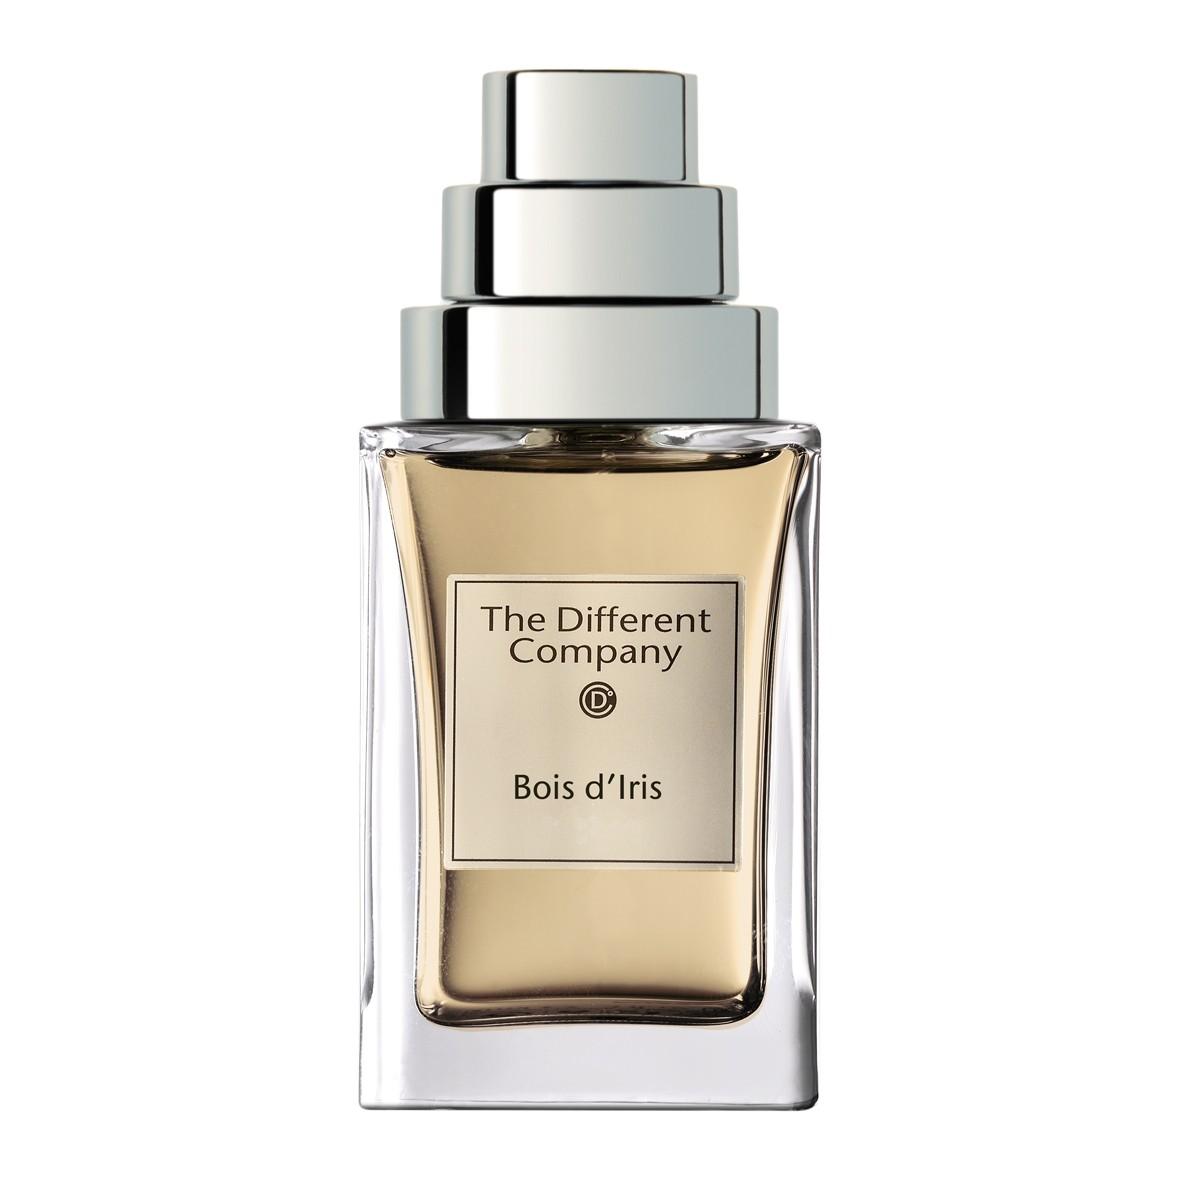 The Different Company Bois d'Iris аромат для женщин